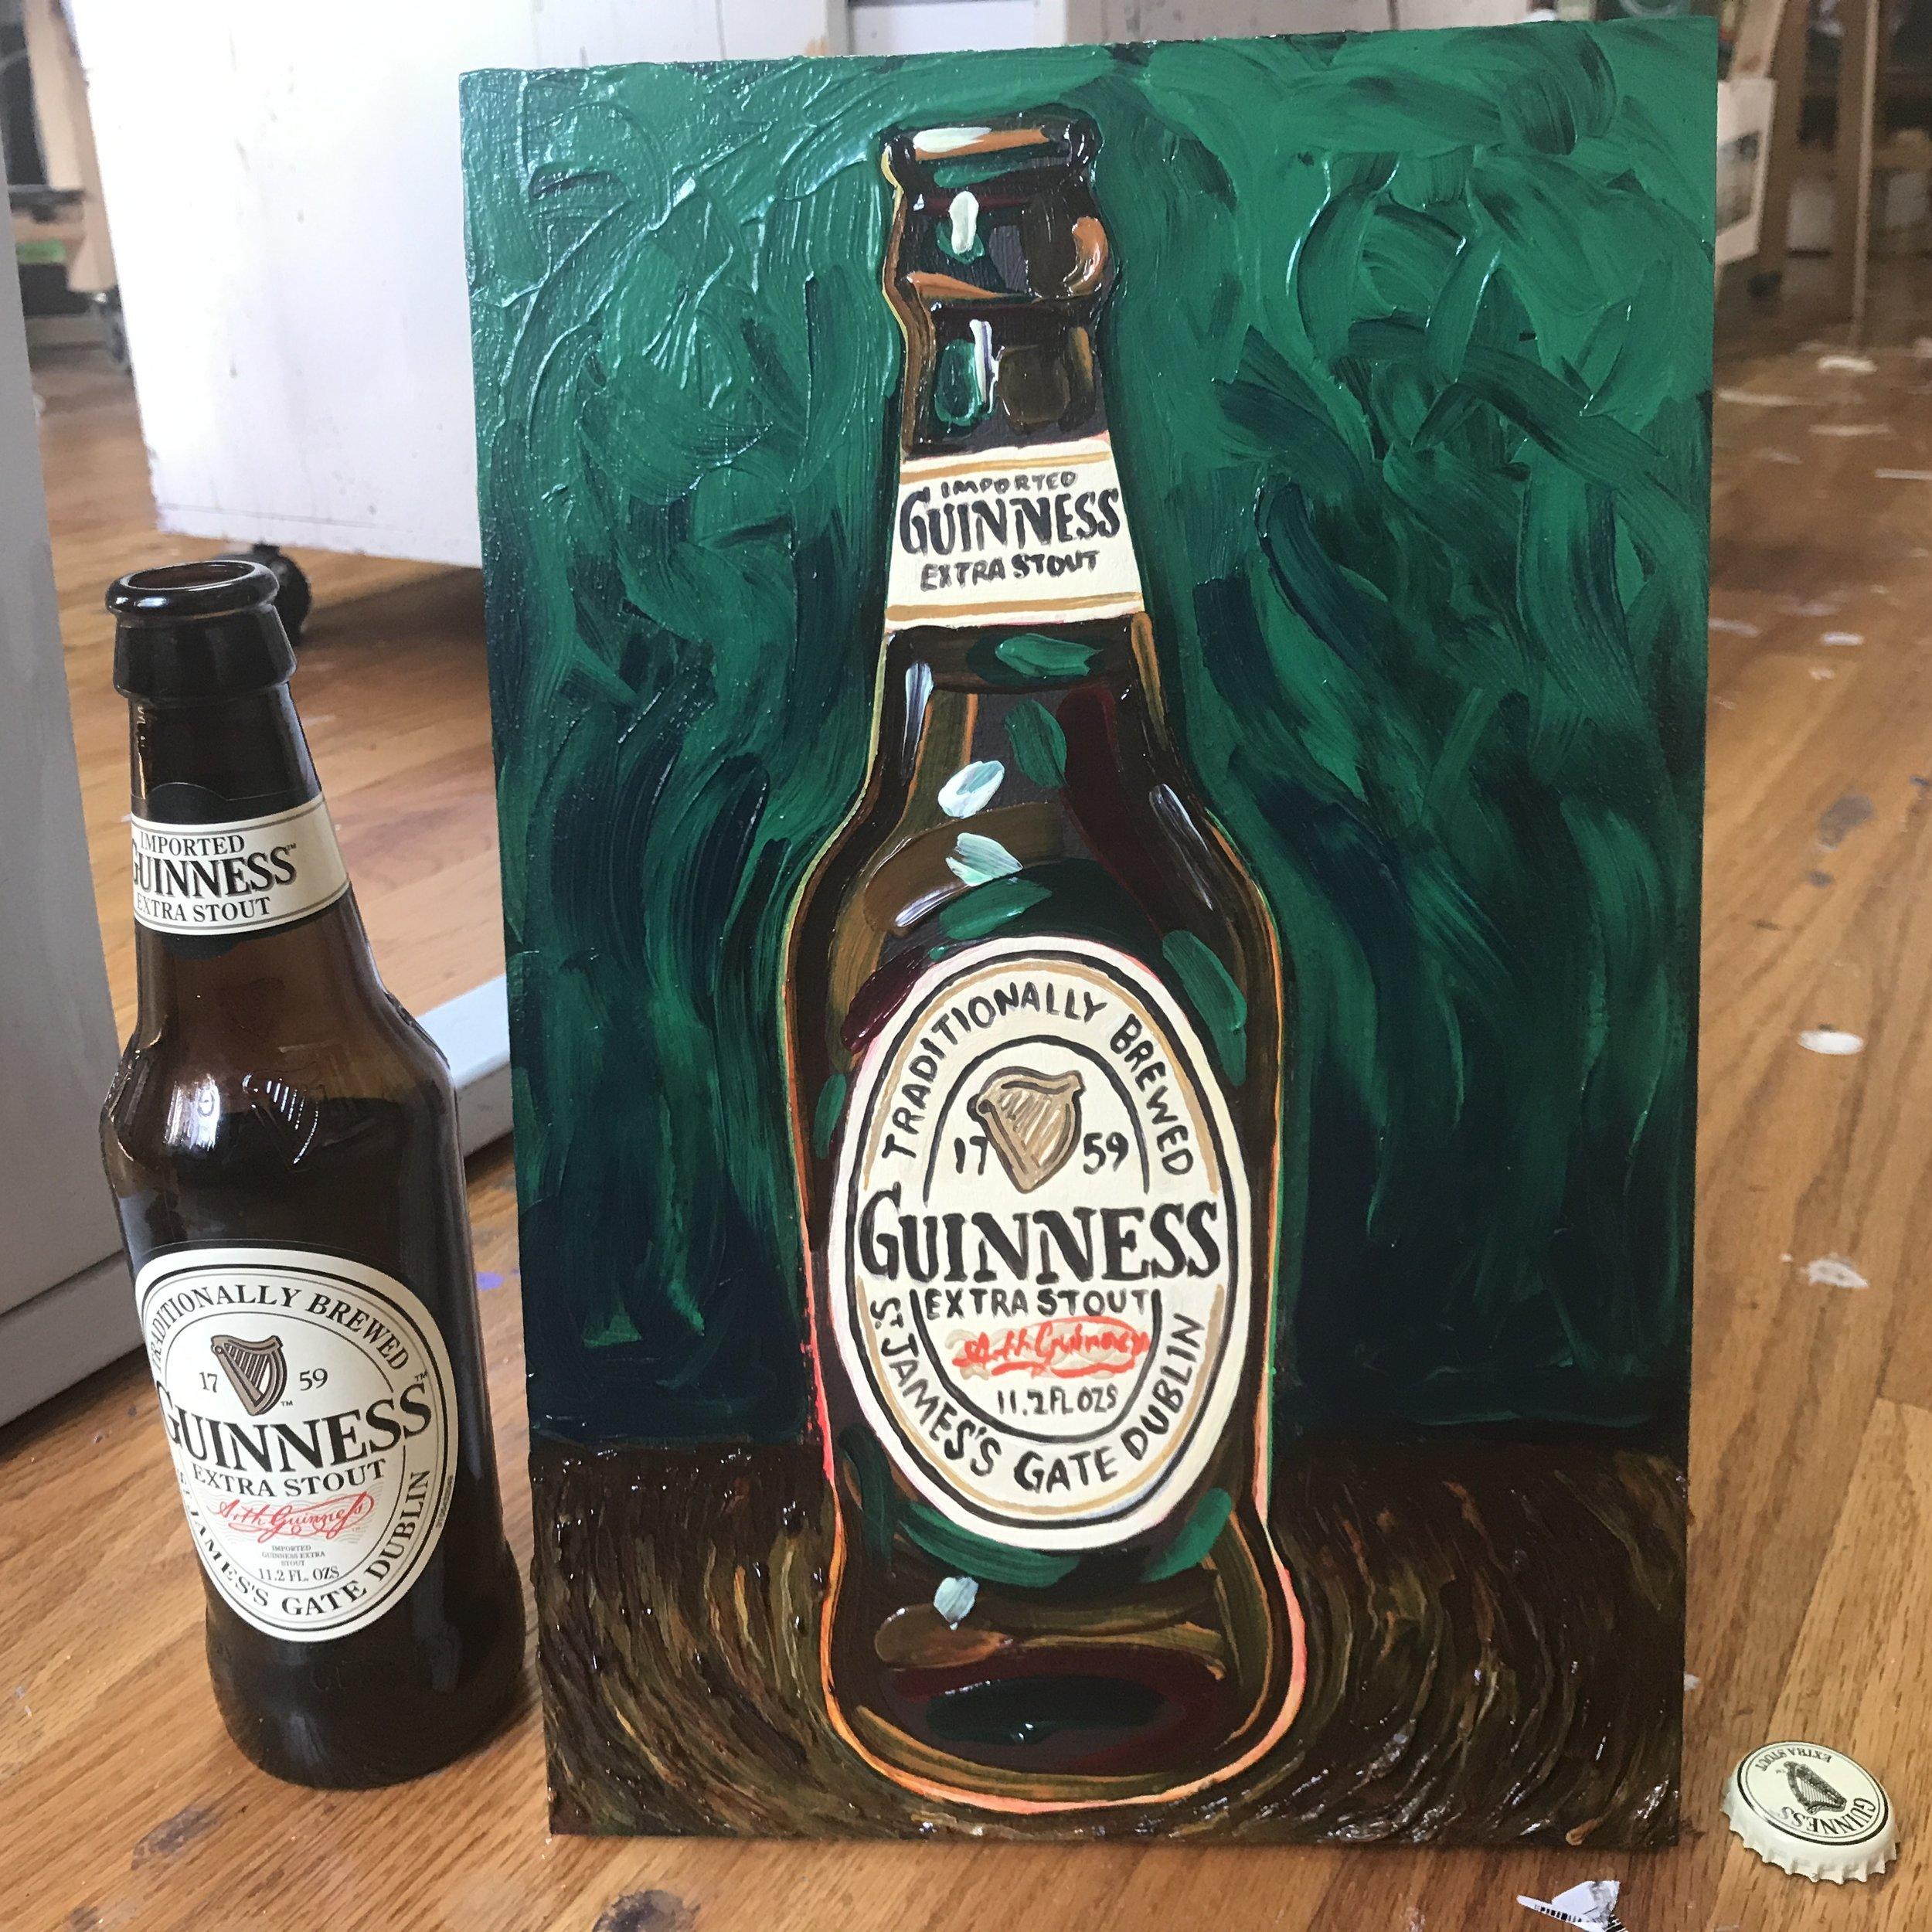 67 Guinness Extra Stout (Ireland)